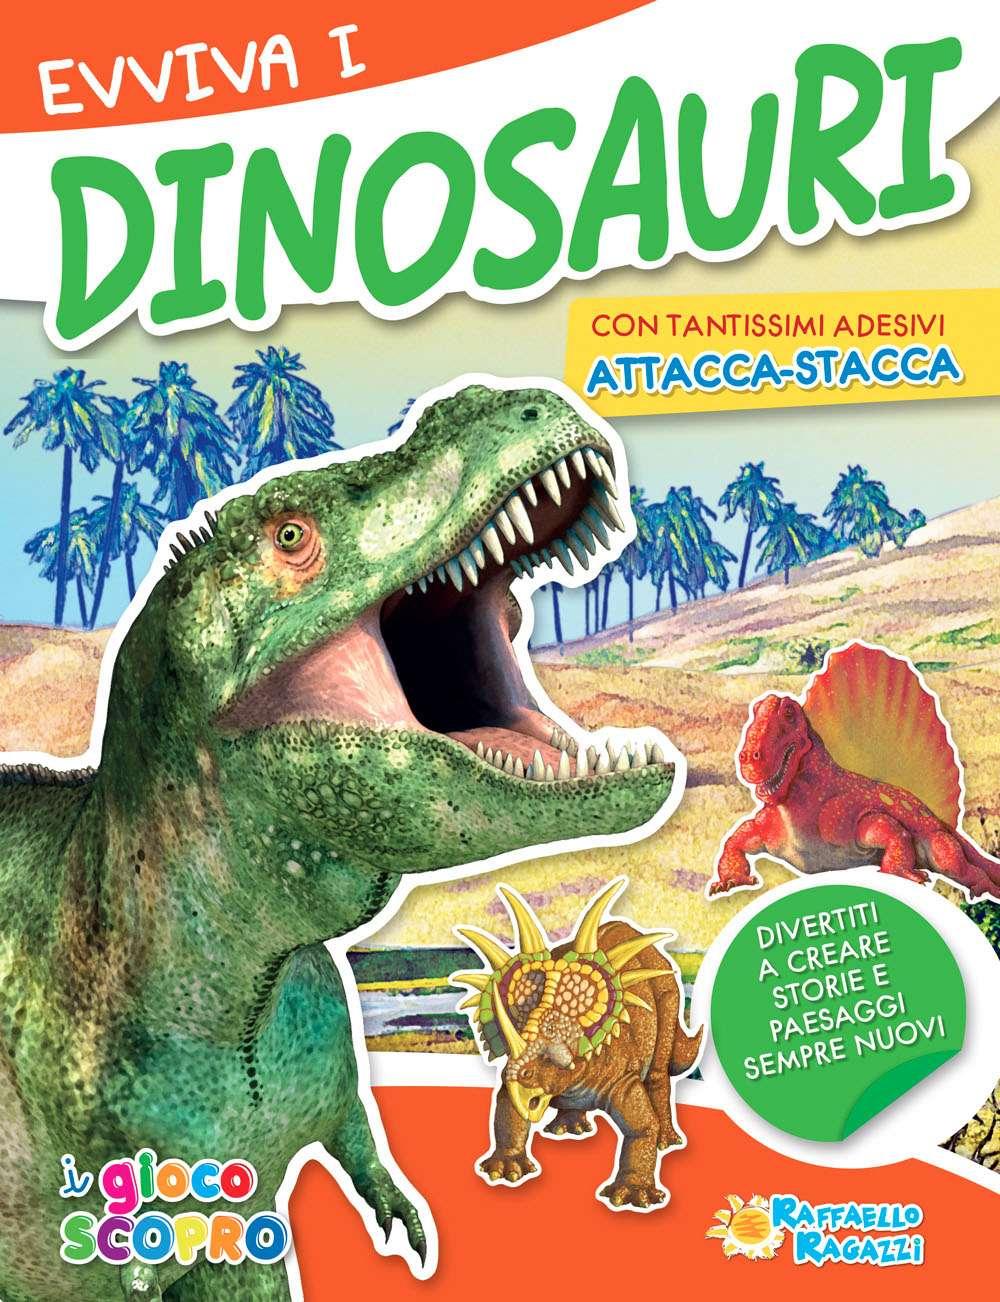 Evviva i dinosauri